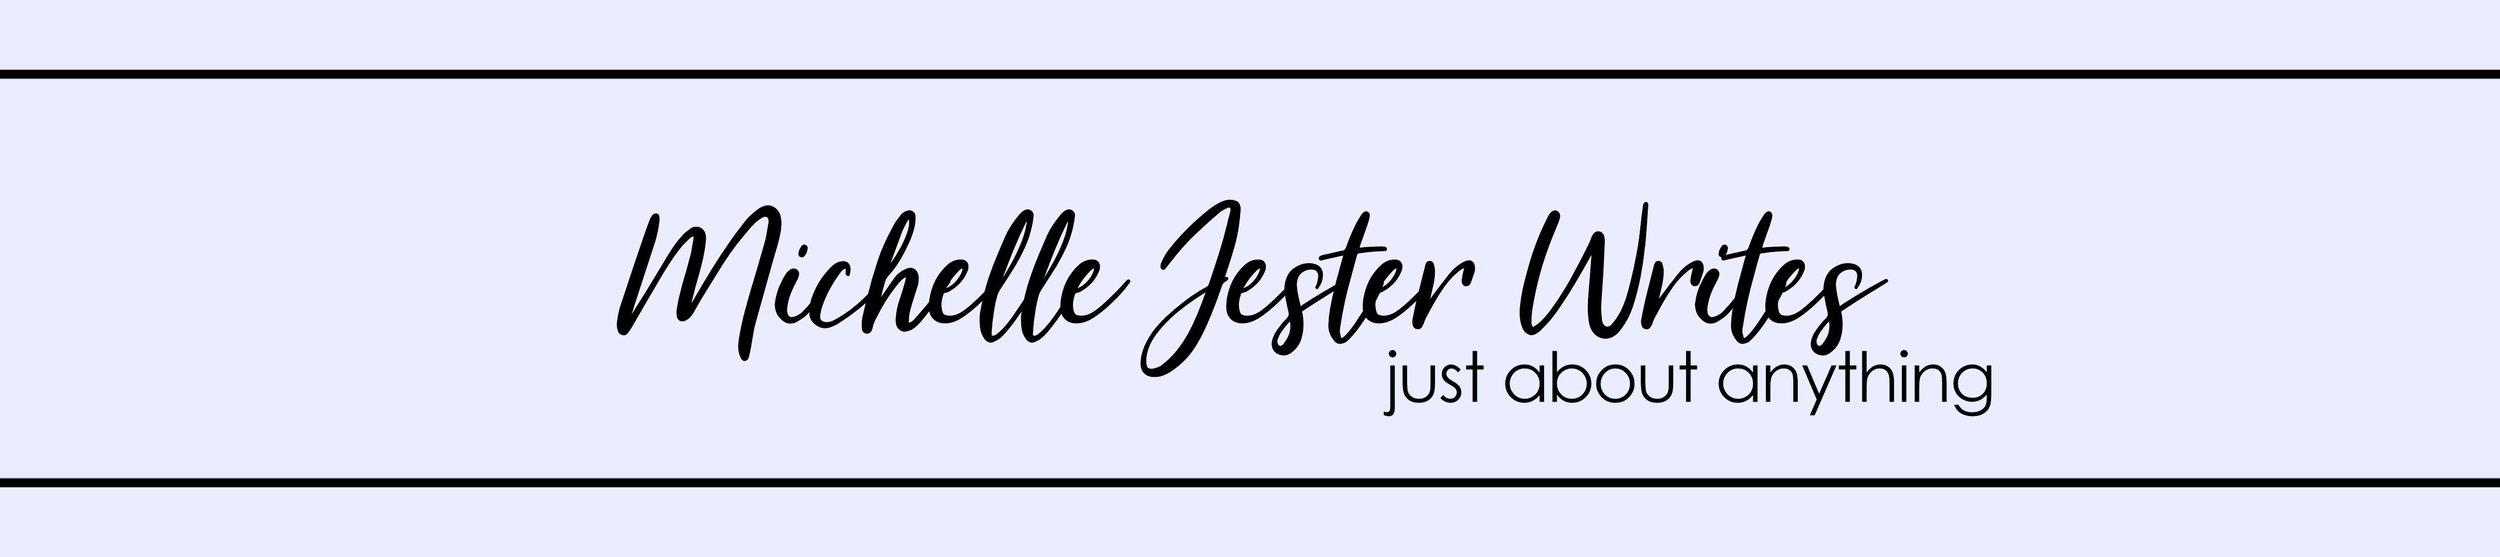 Michelle Jester writes MAIN web banner3a lighter.jpg